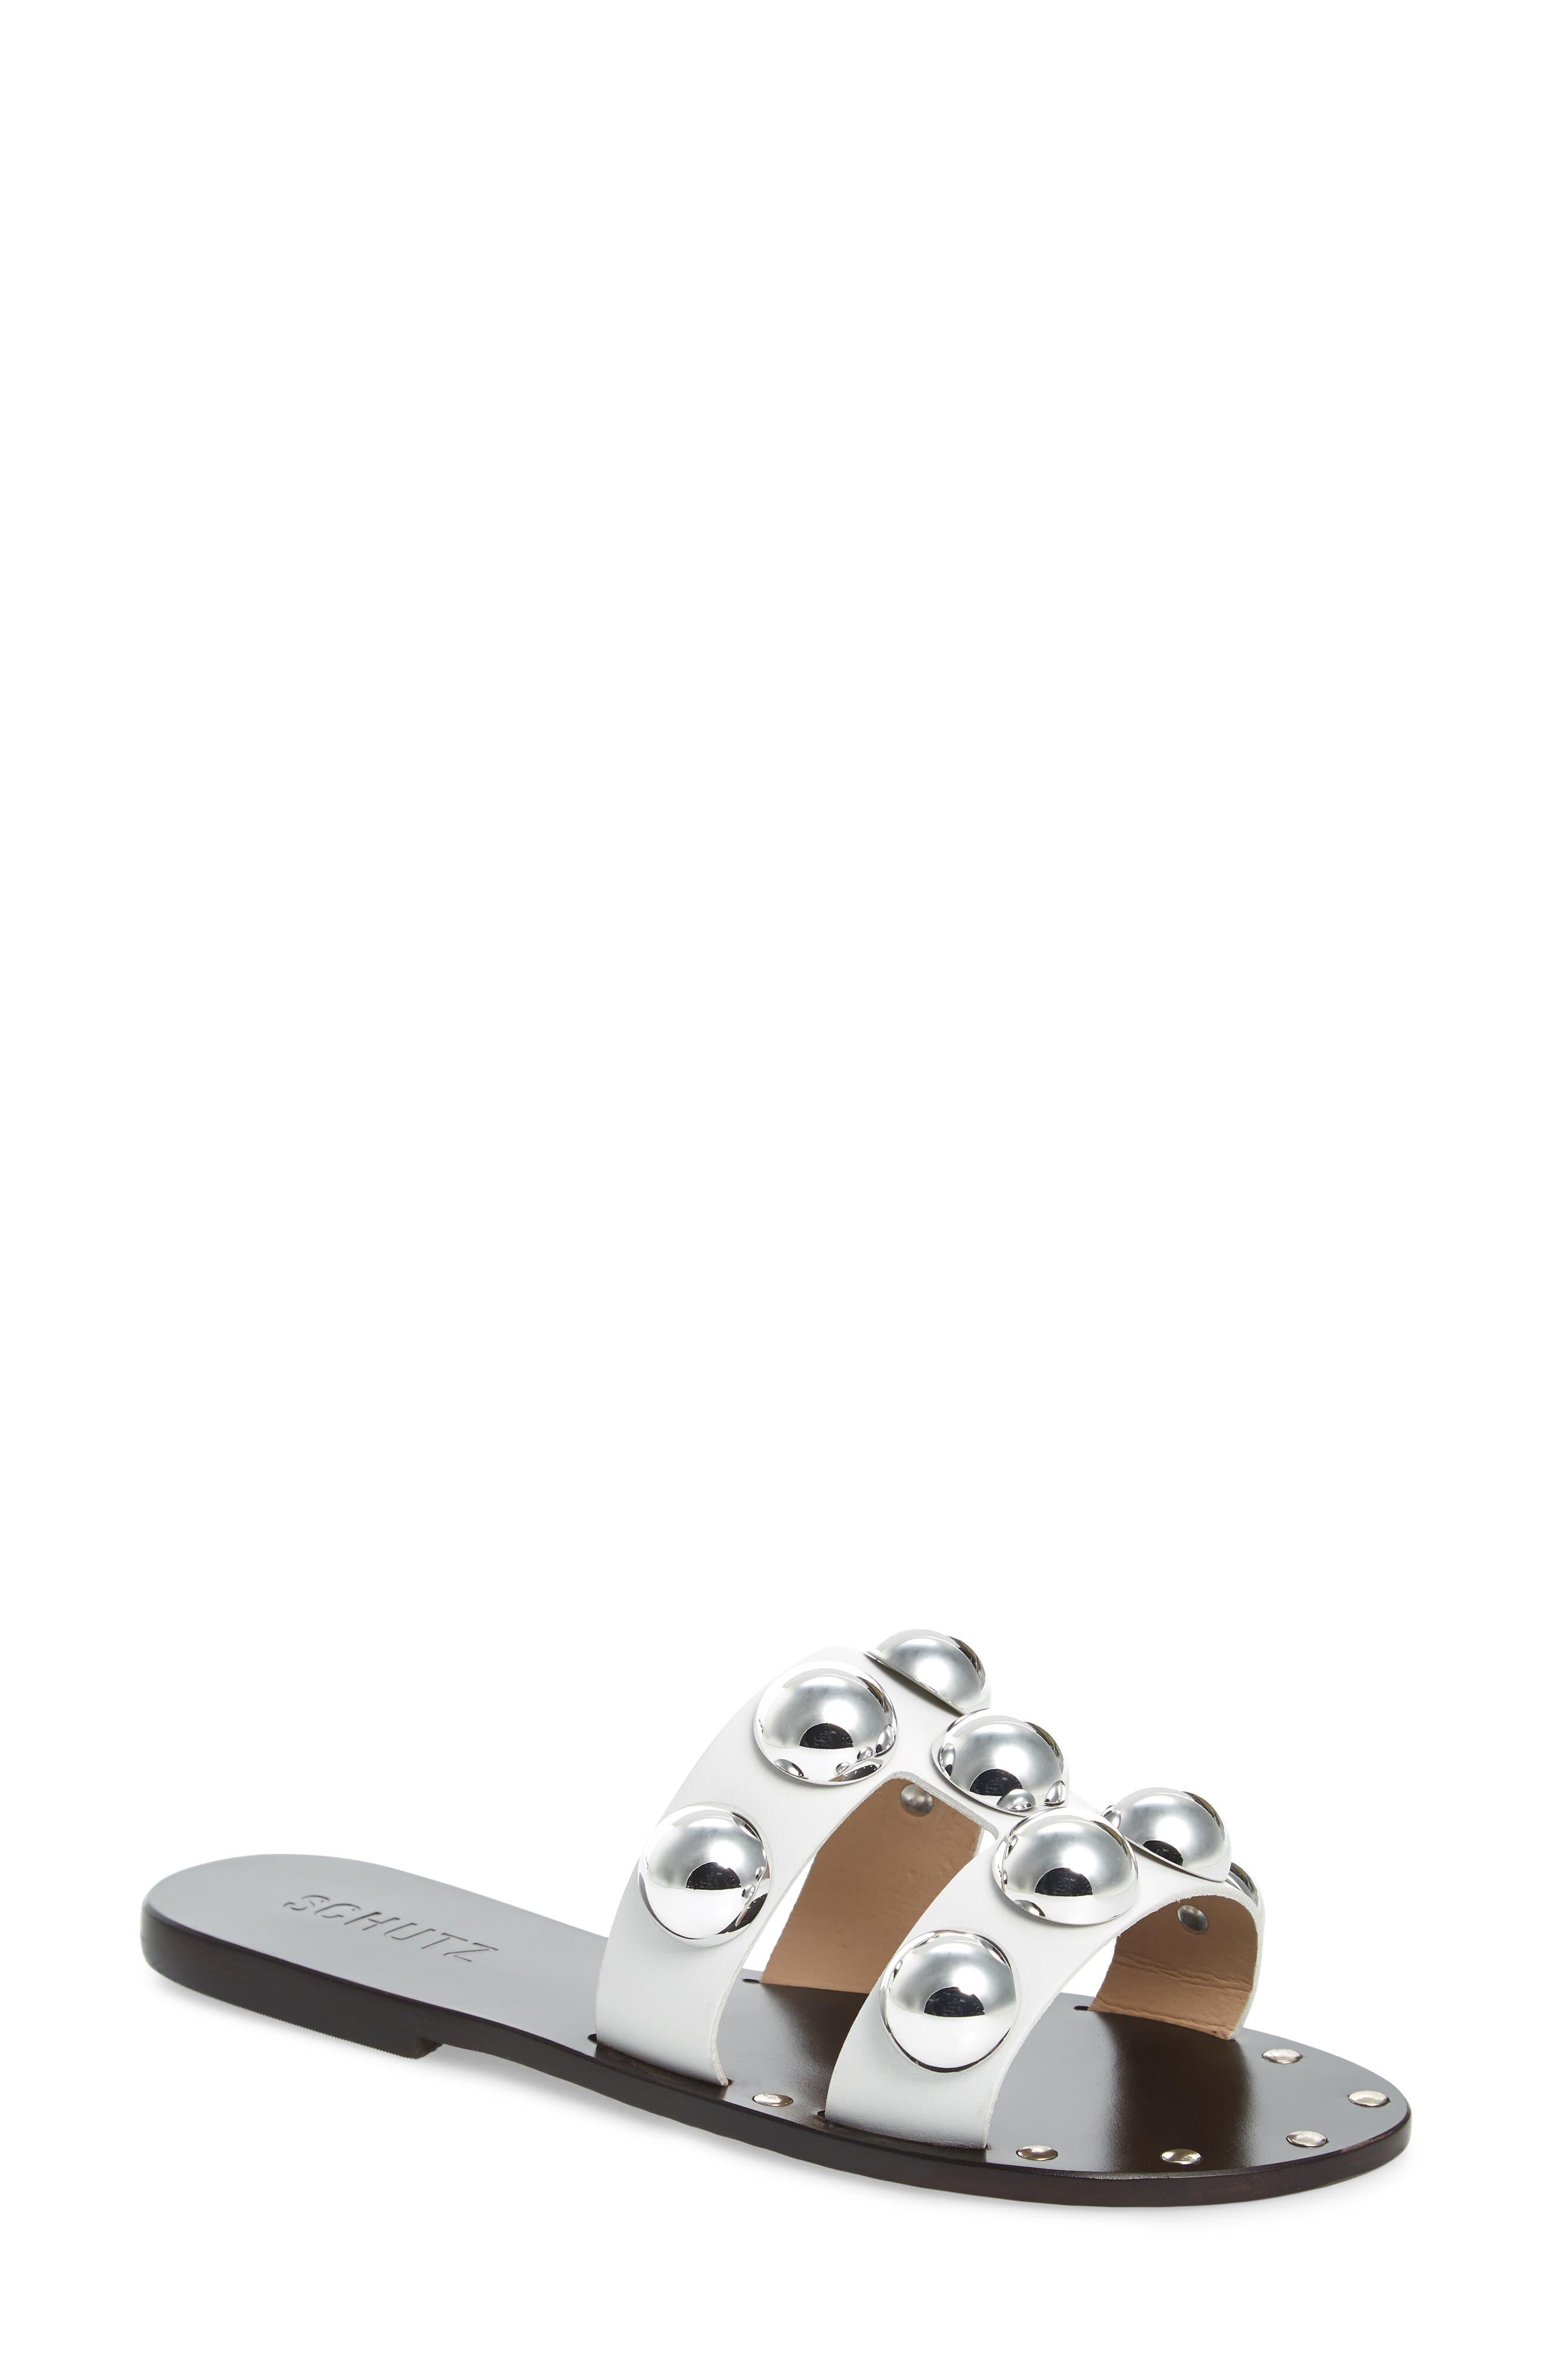 Benedita Slide Sandal,                         Main,                         color, WHITE